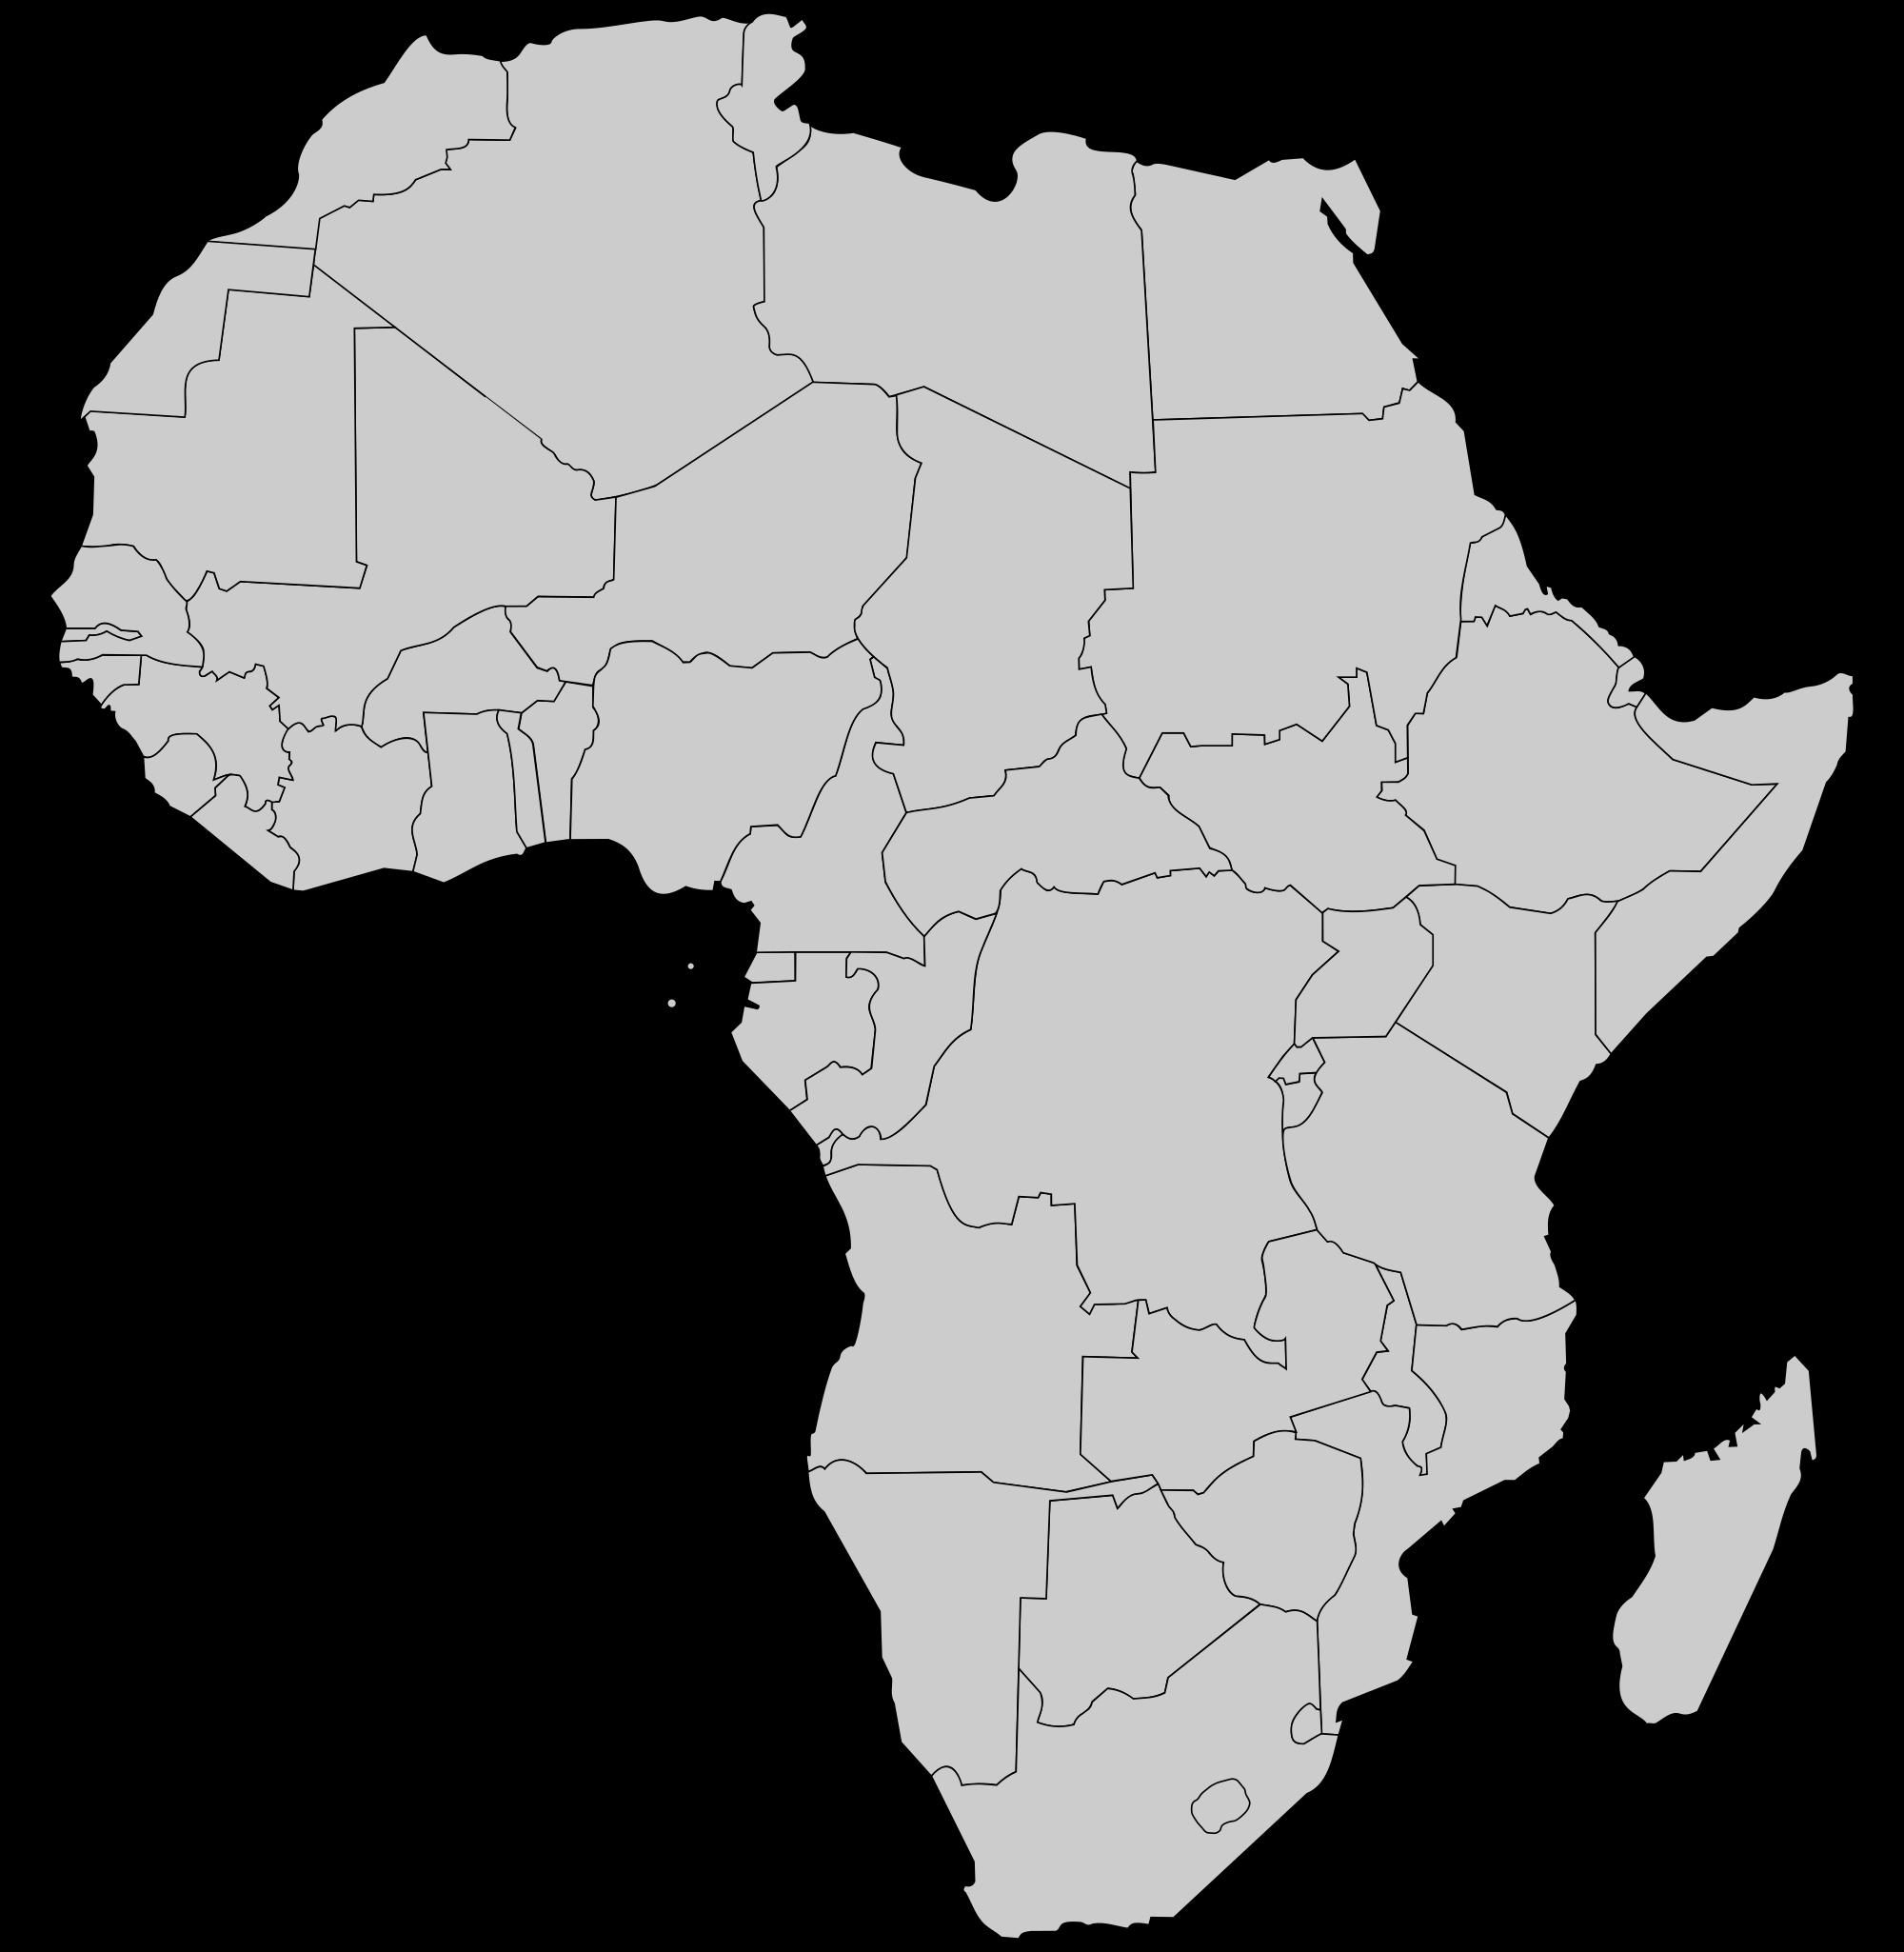 png download africa transparent editable #88804448